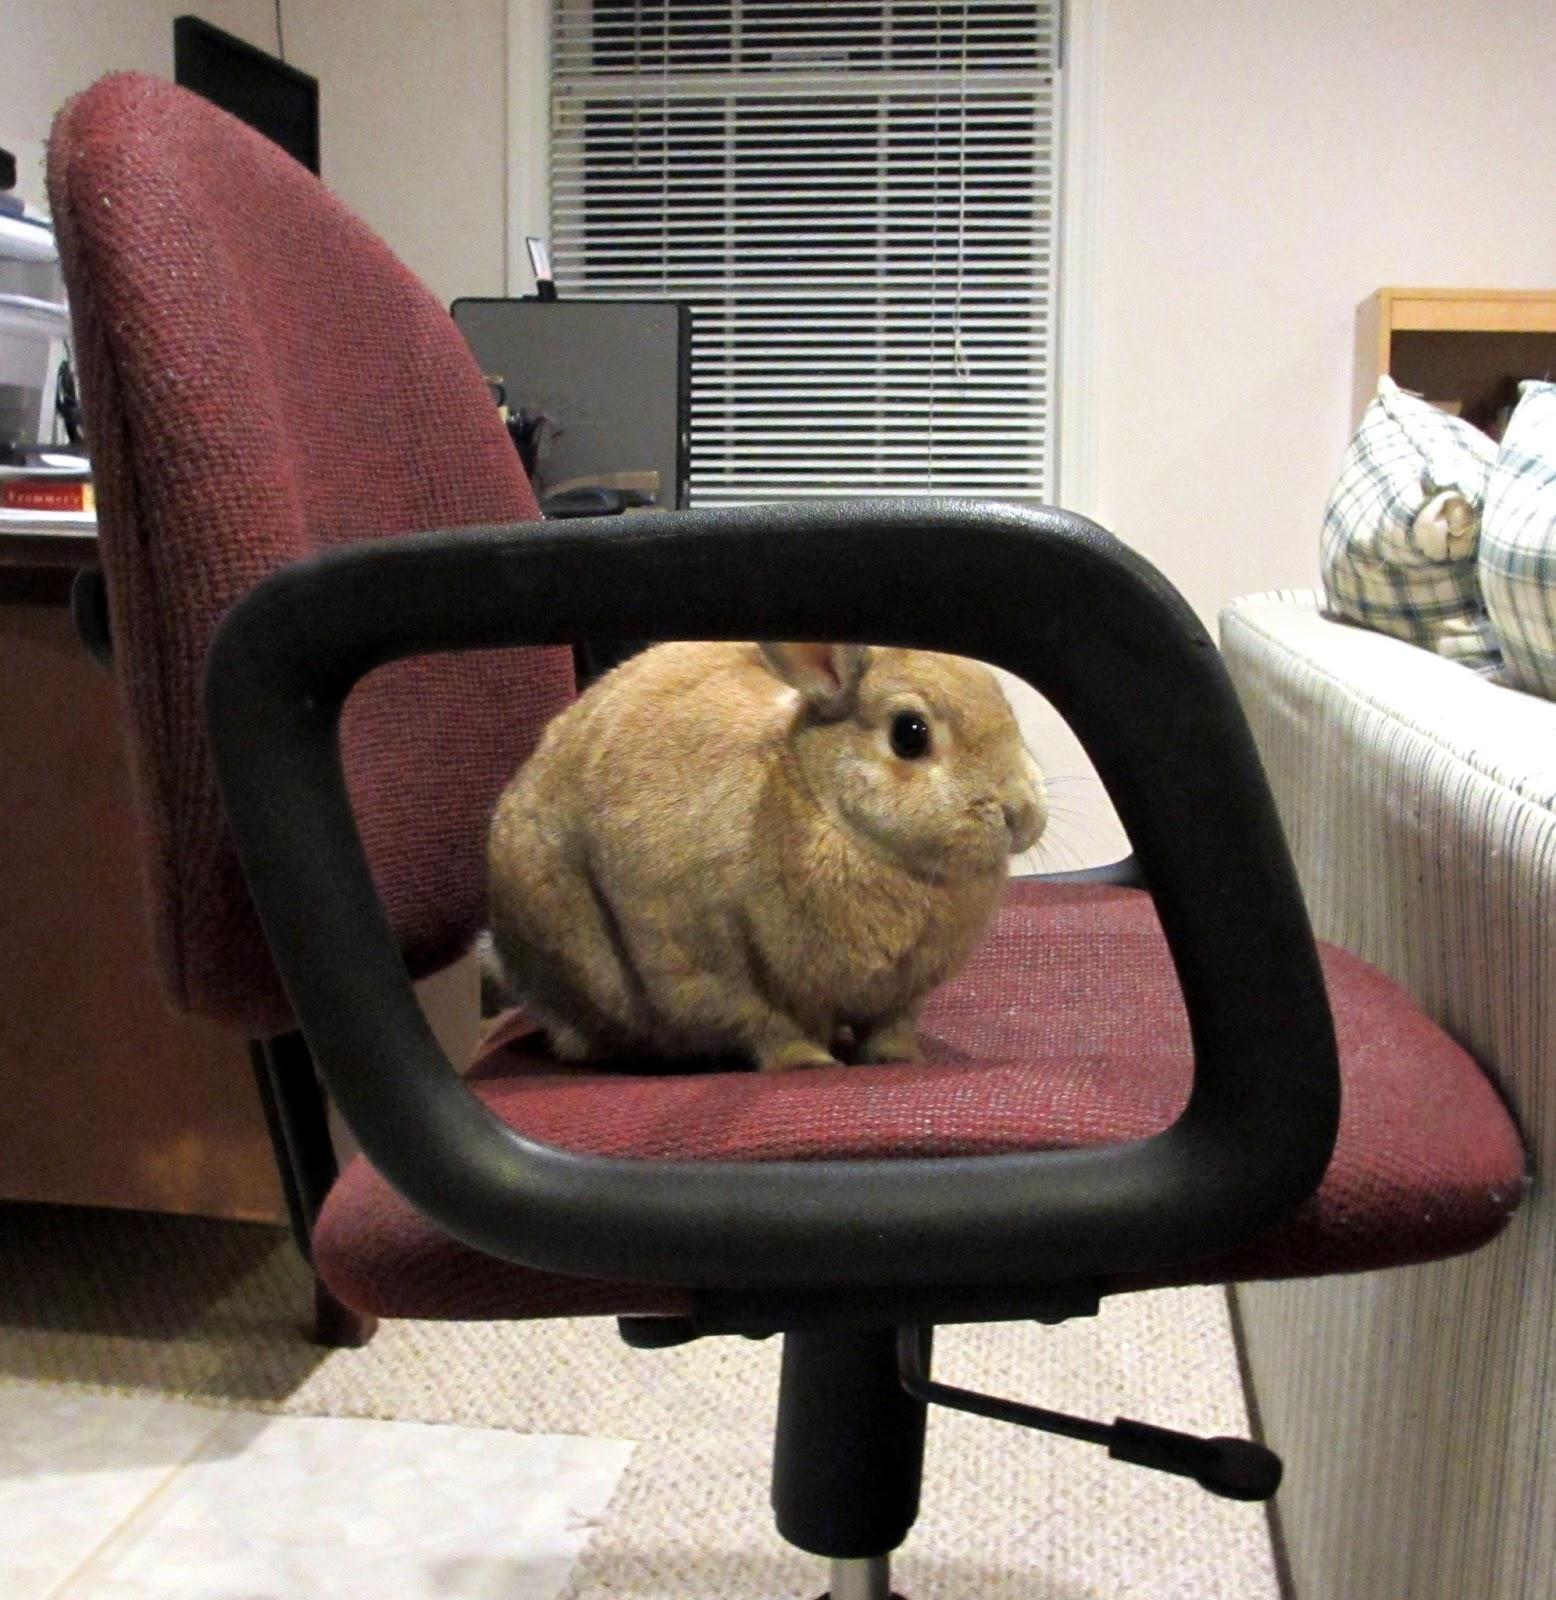 best tv watching chair for bathtub rabbit ramblings executive bunny bunya